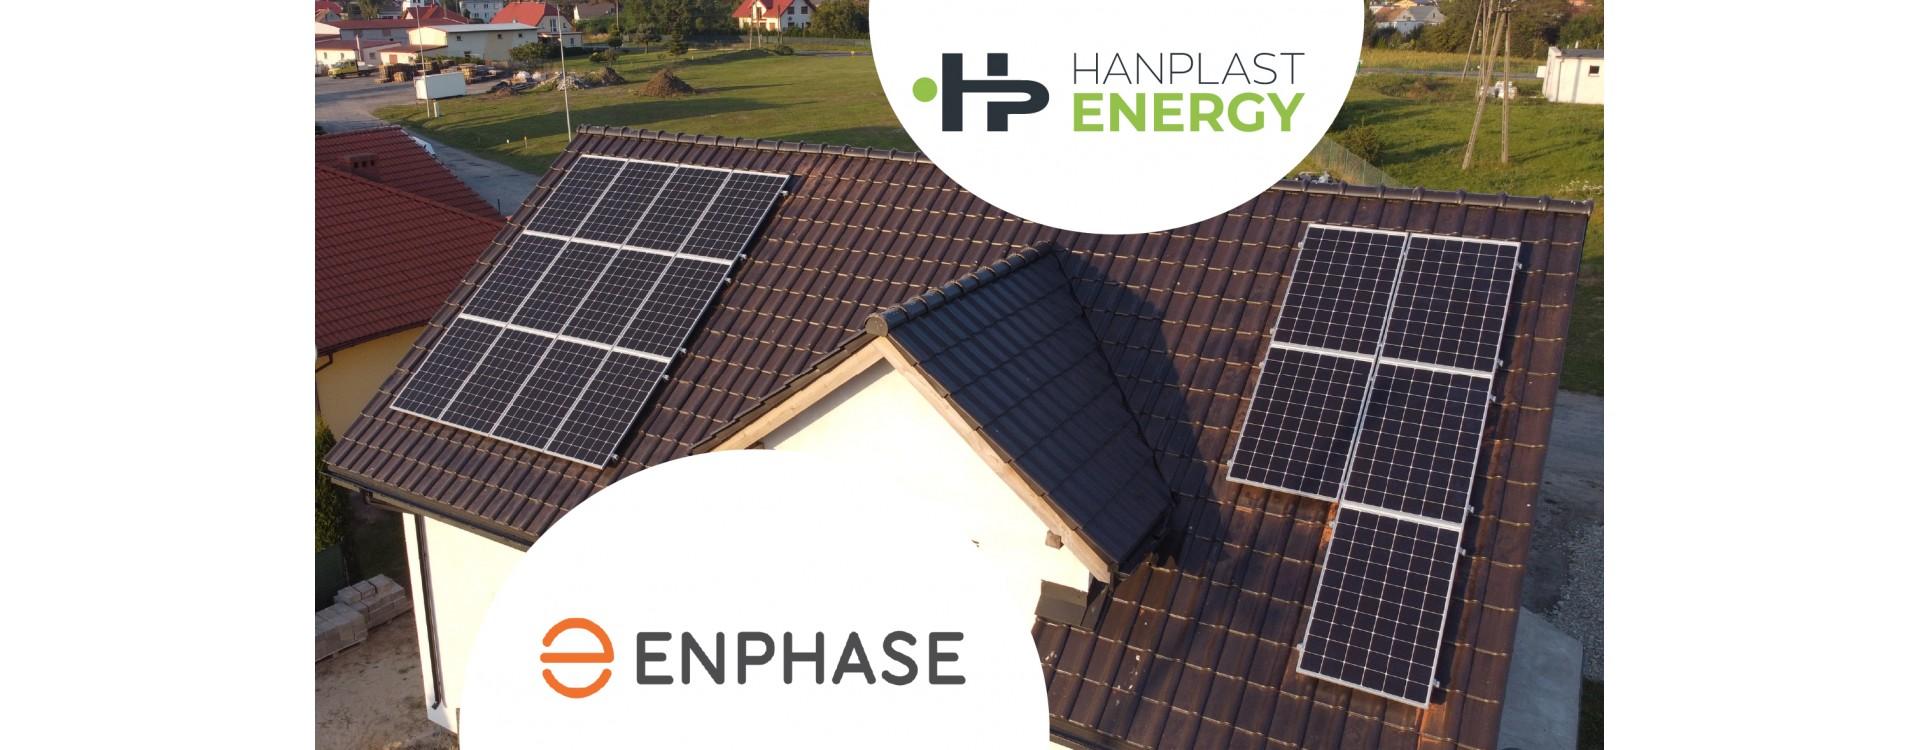 Mikroinwertery Enphase w ofercie Hanplast Energy